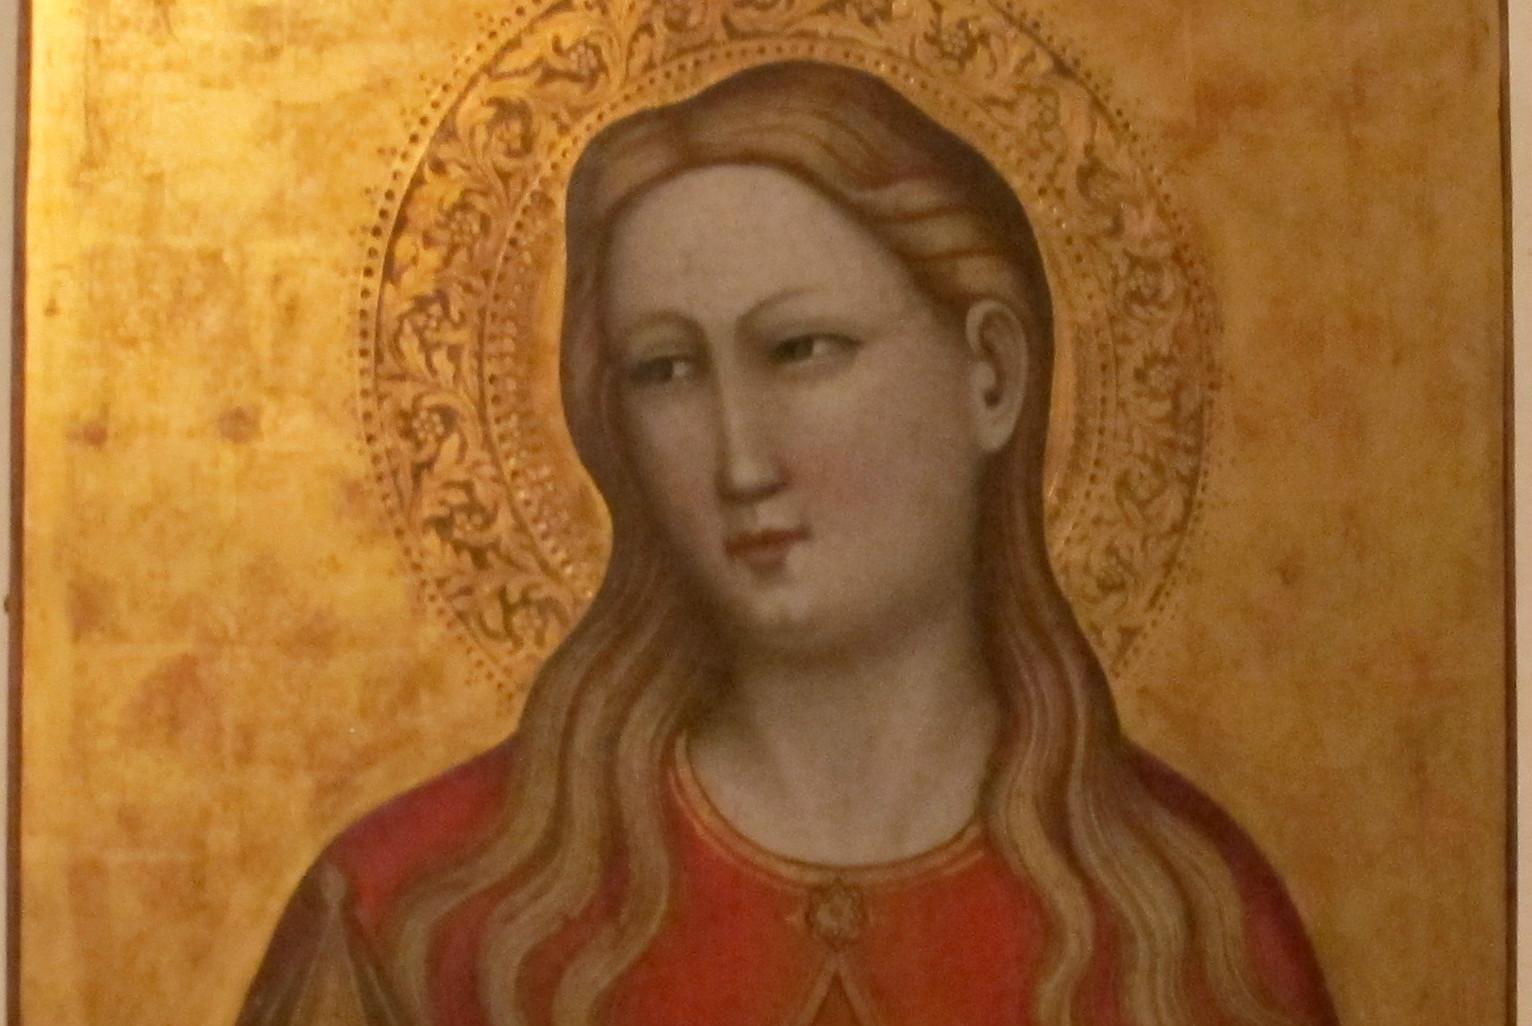 Magdalene_Antonio_veneziano,_maddalena,_1368-1388_ca_cc crop.